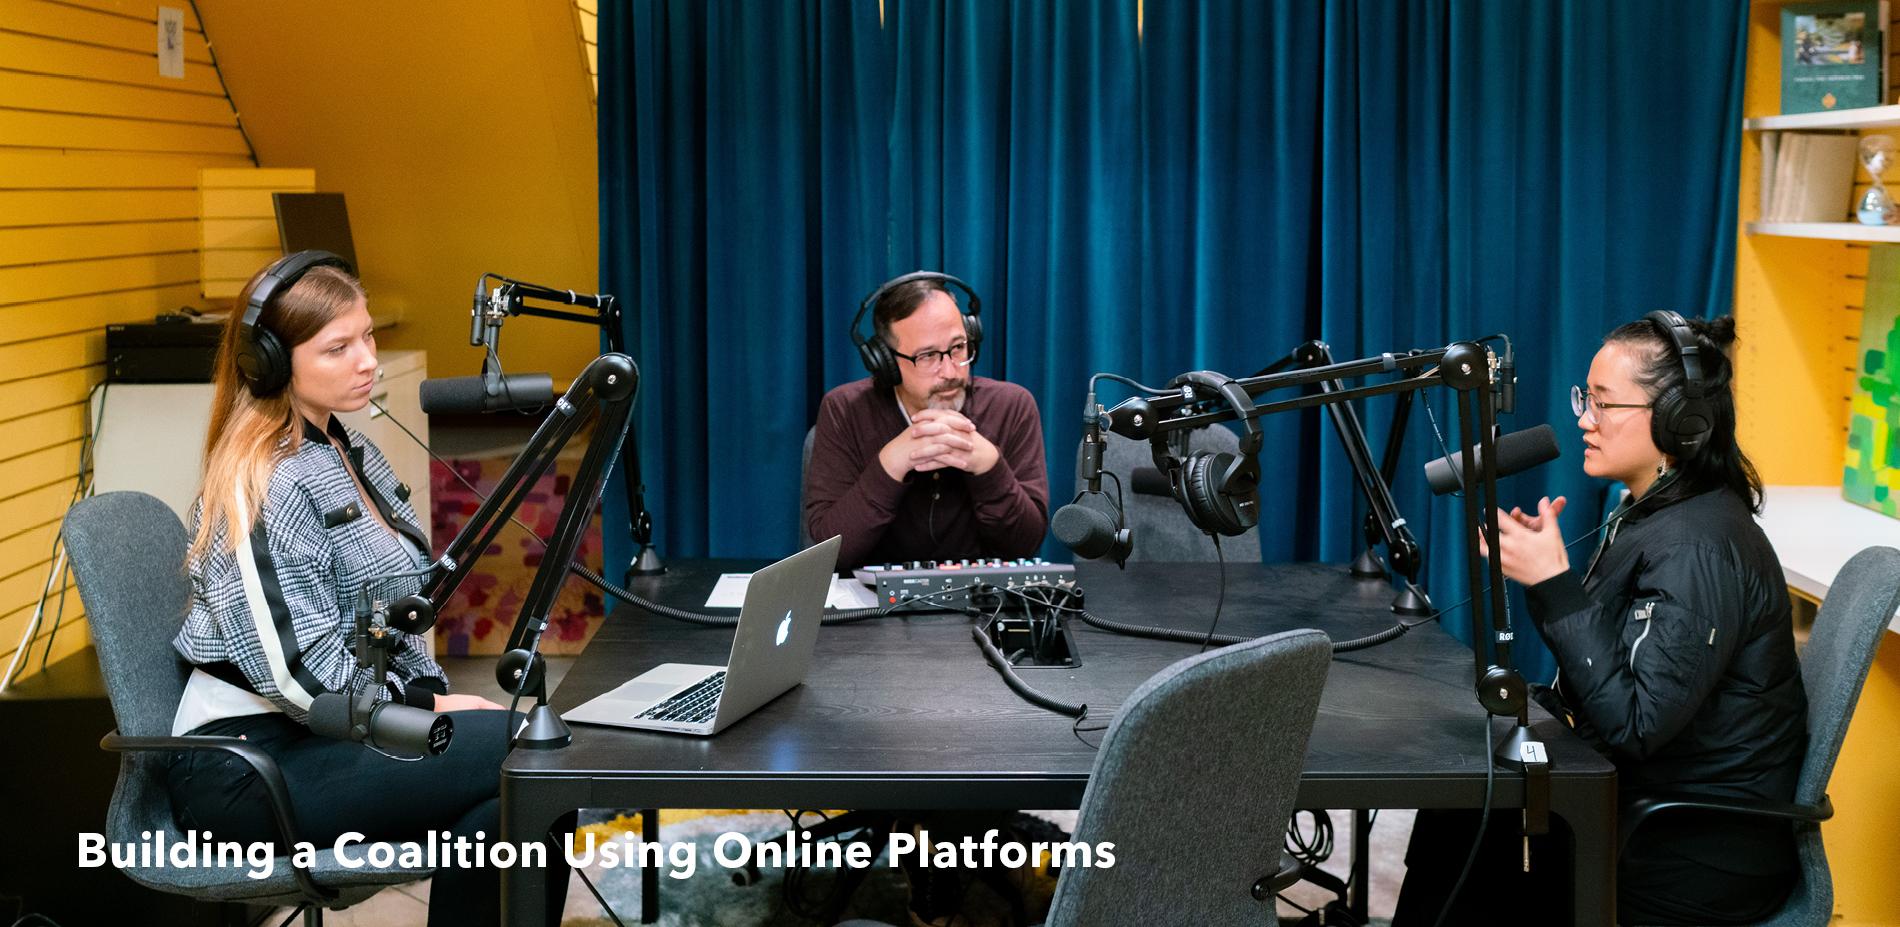 Building a Coalition Using Online Platforms